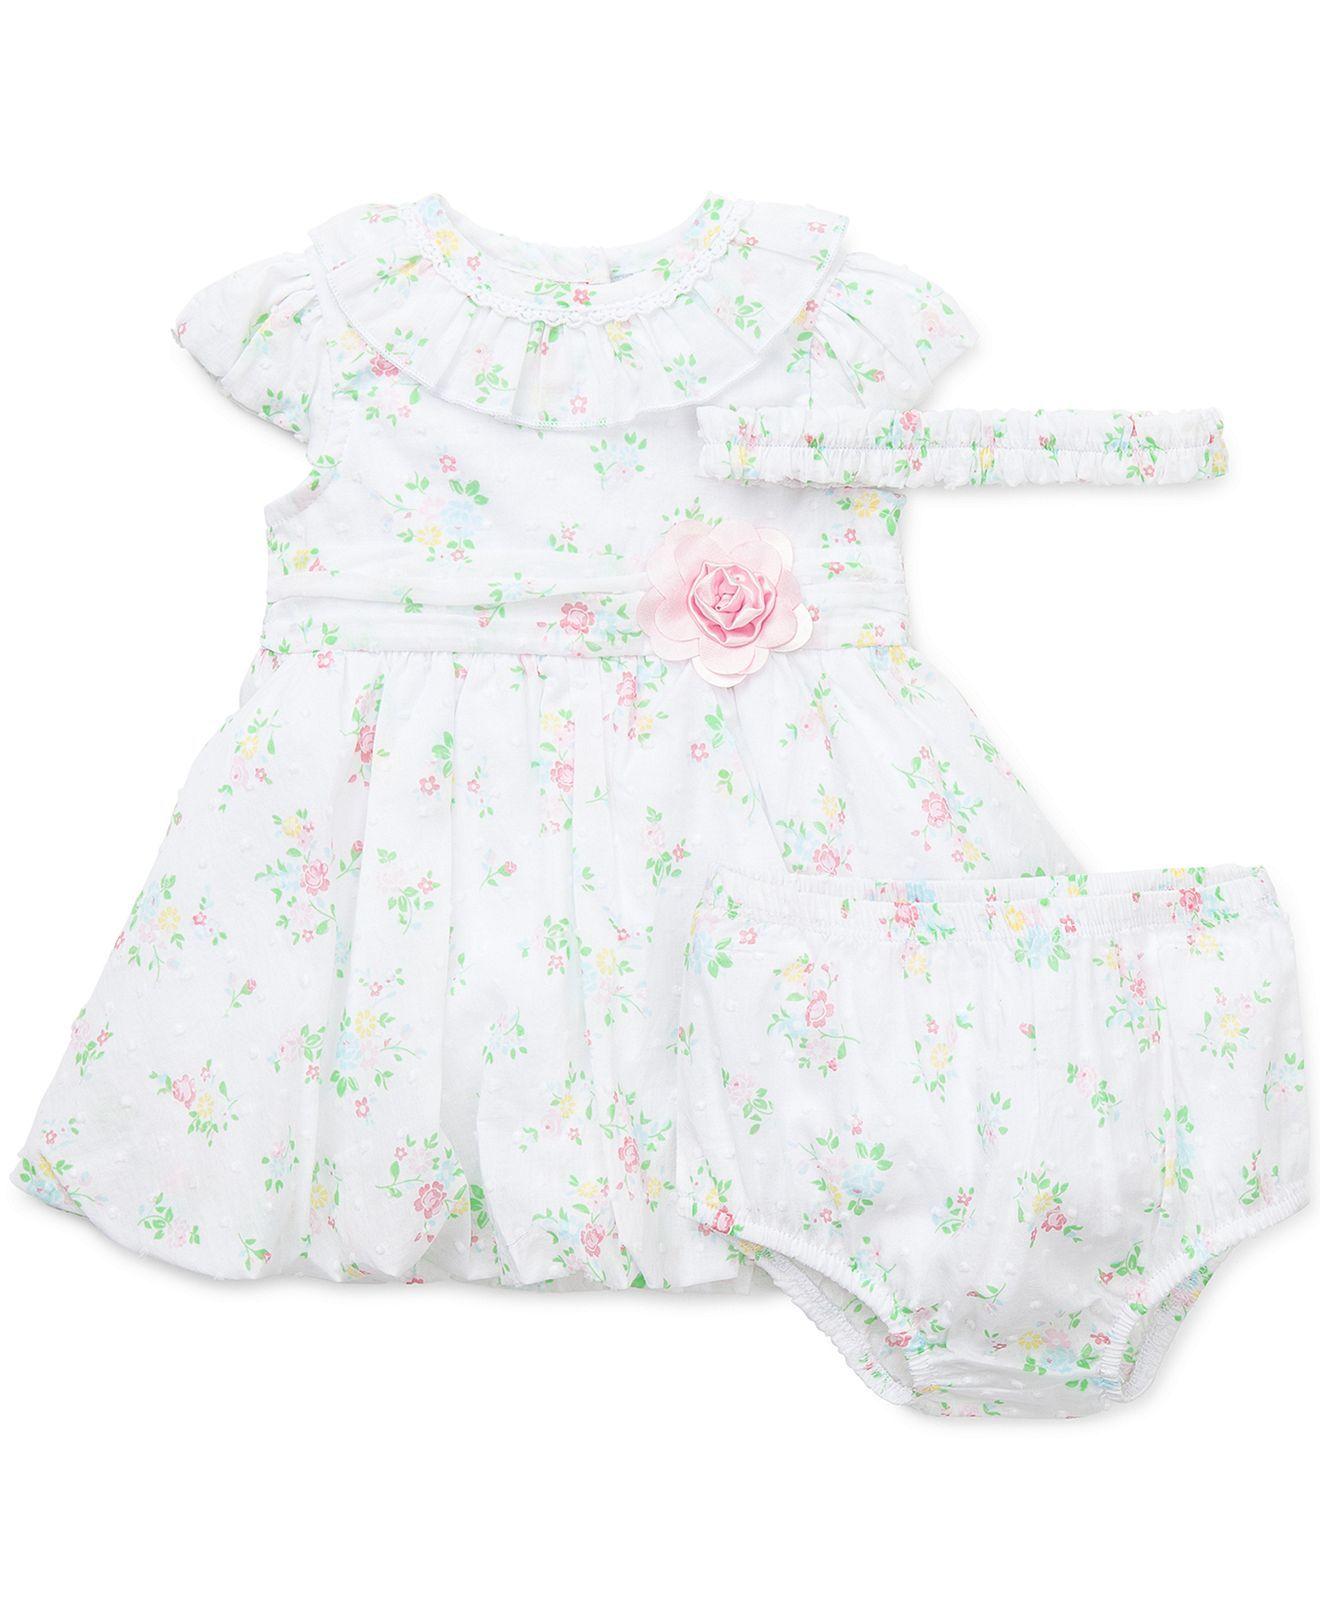 Little Me Baby Girls 3 Piece Joyful Dress Panty & Headband Set